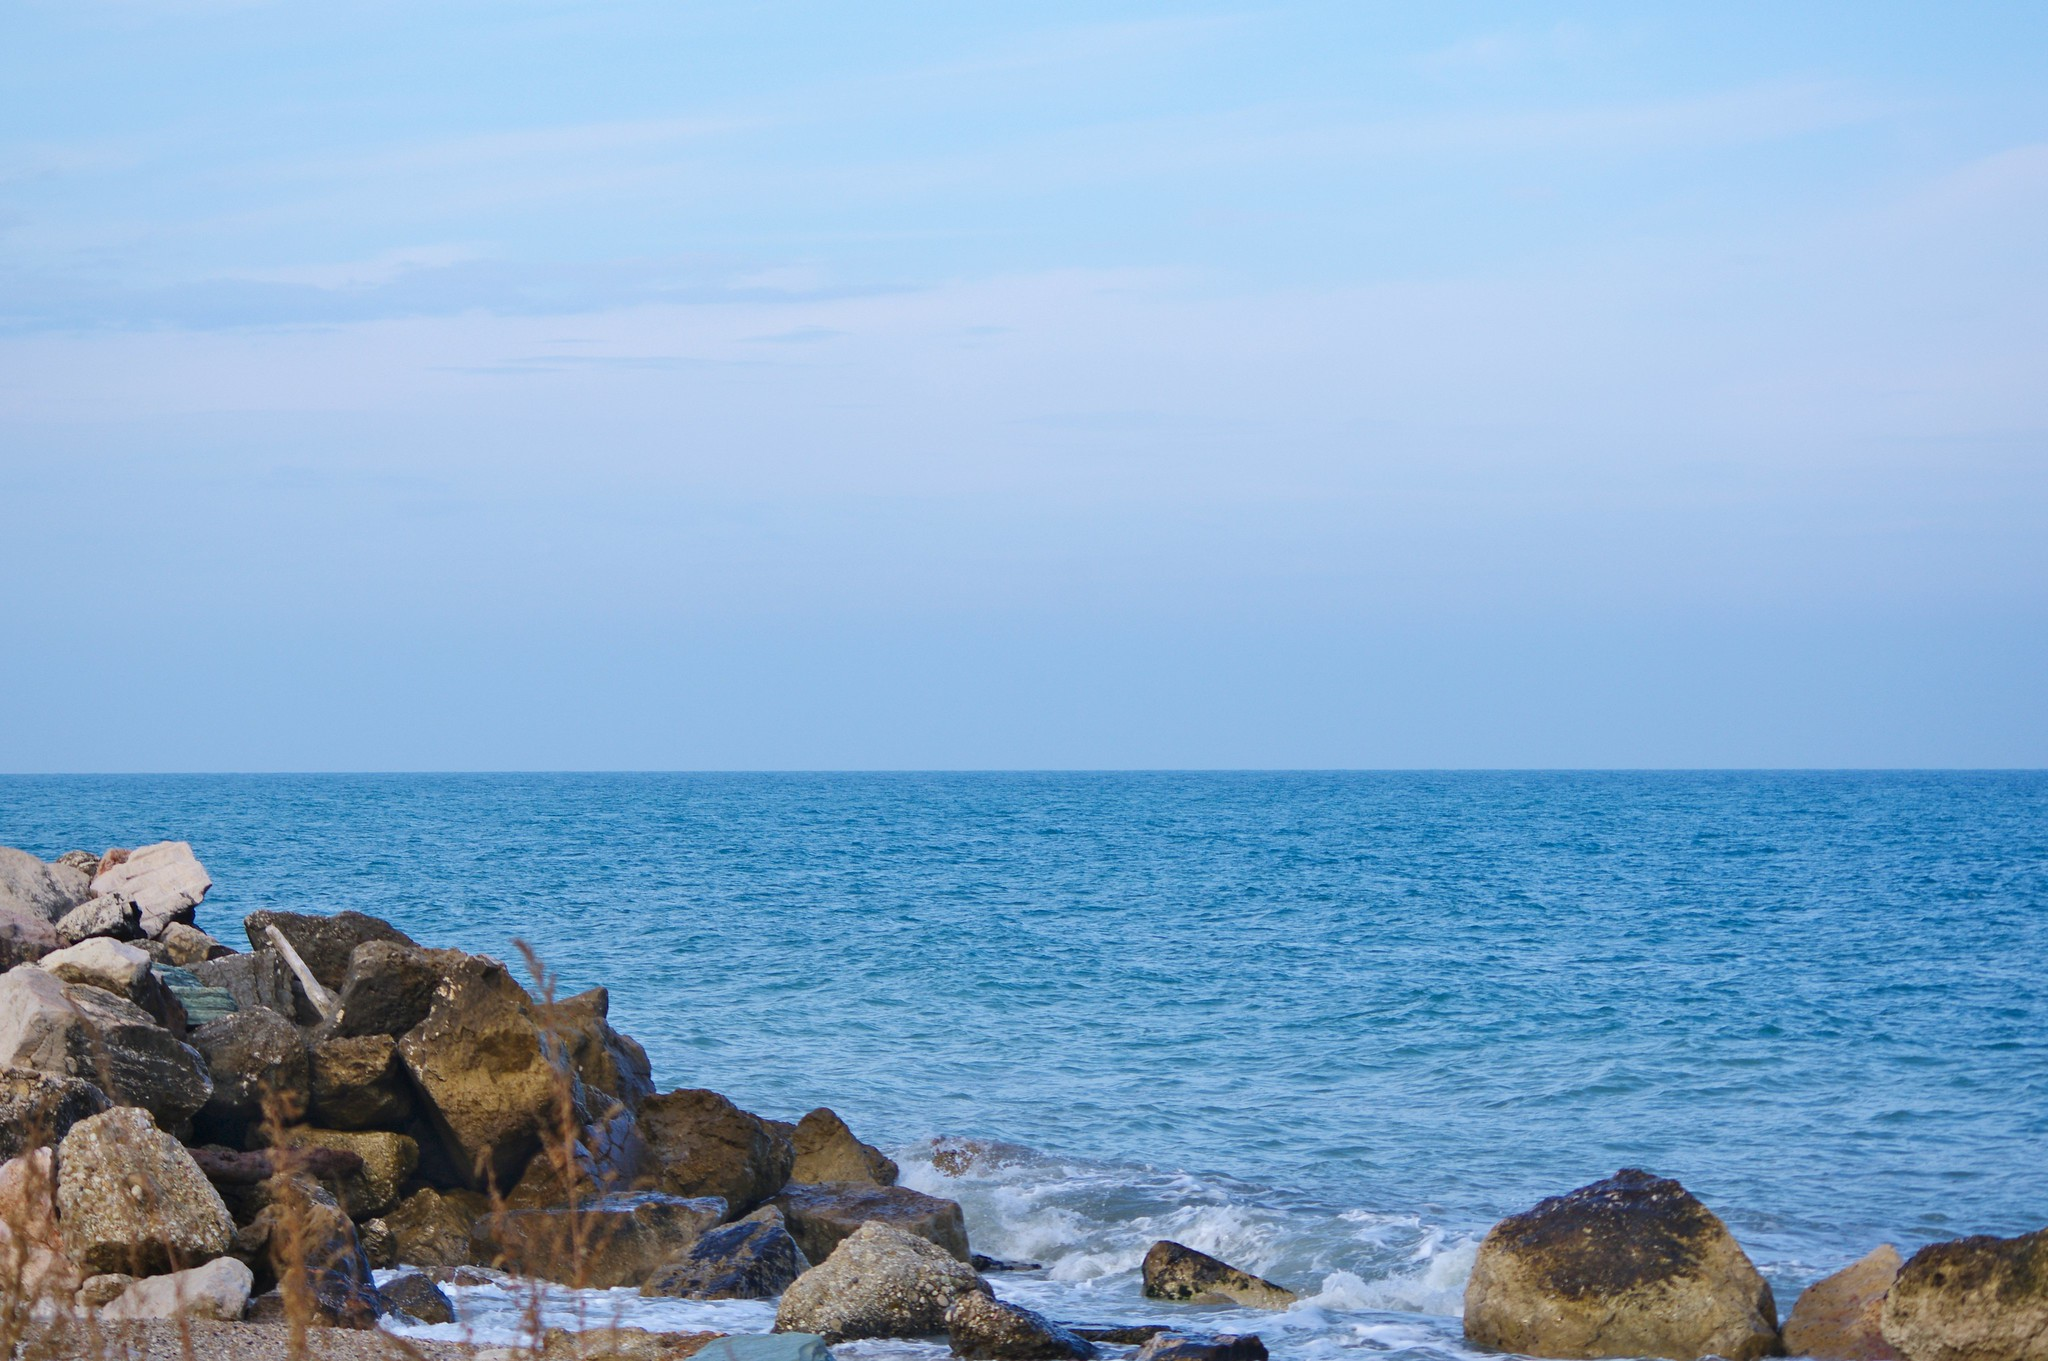 marina di altidona